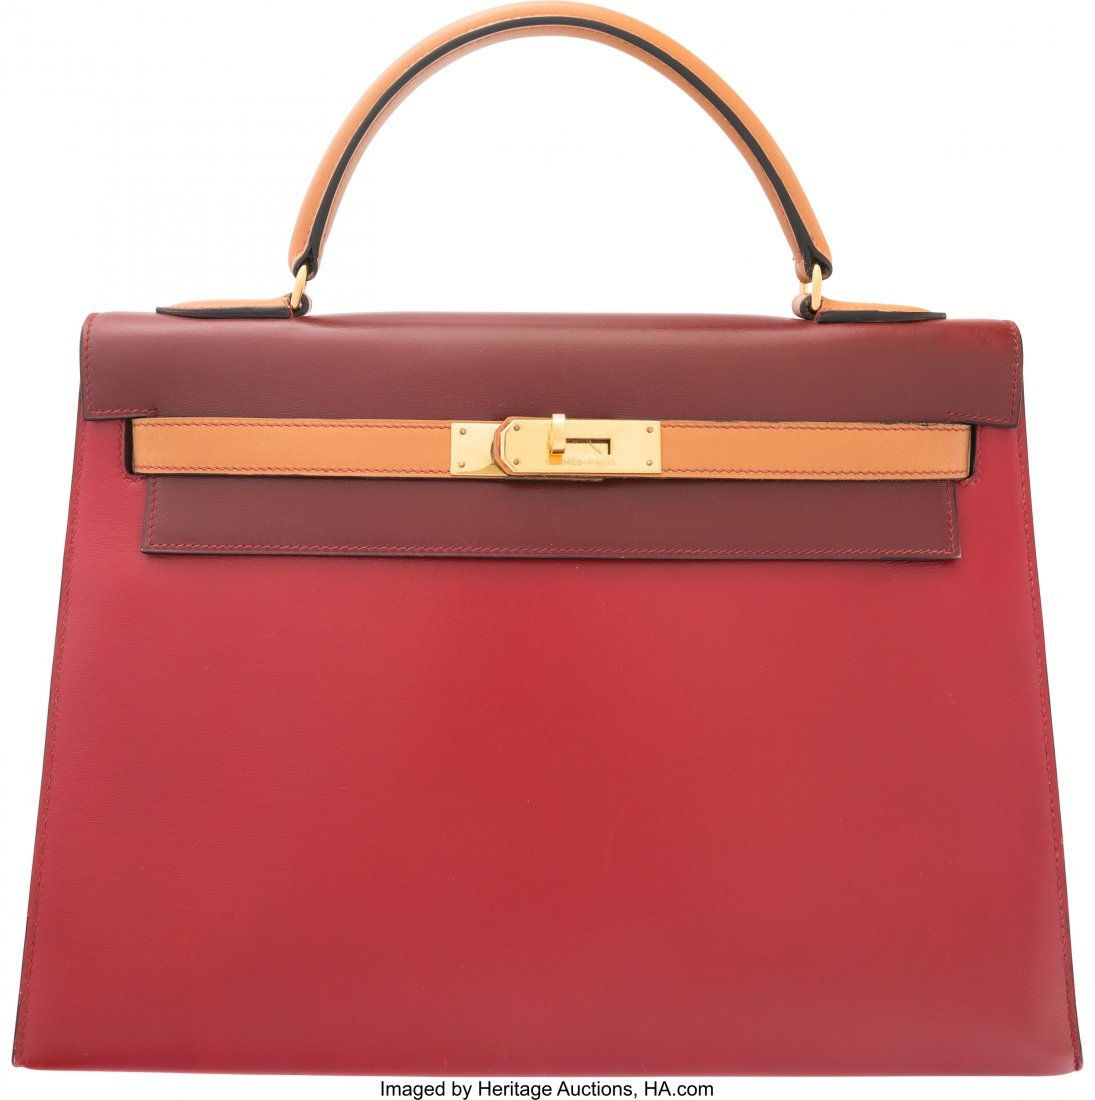 58070: Hermes 32cm Limited Edition Tri-Color Rouge Vif